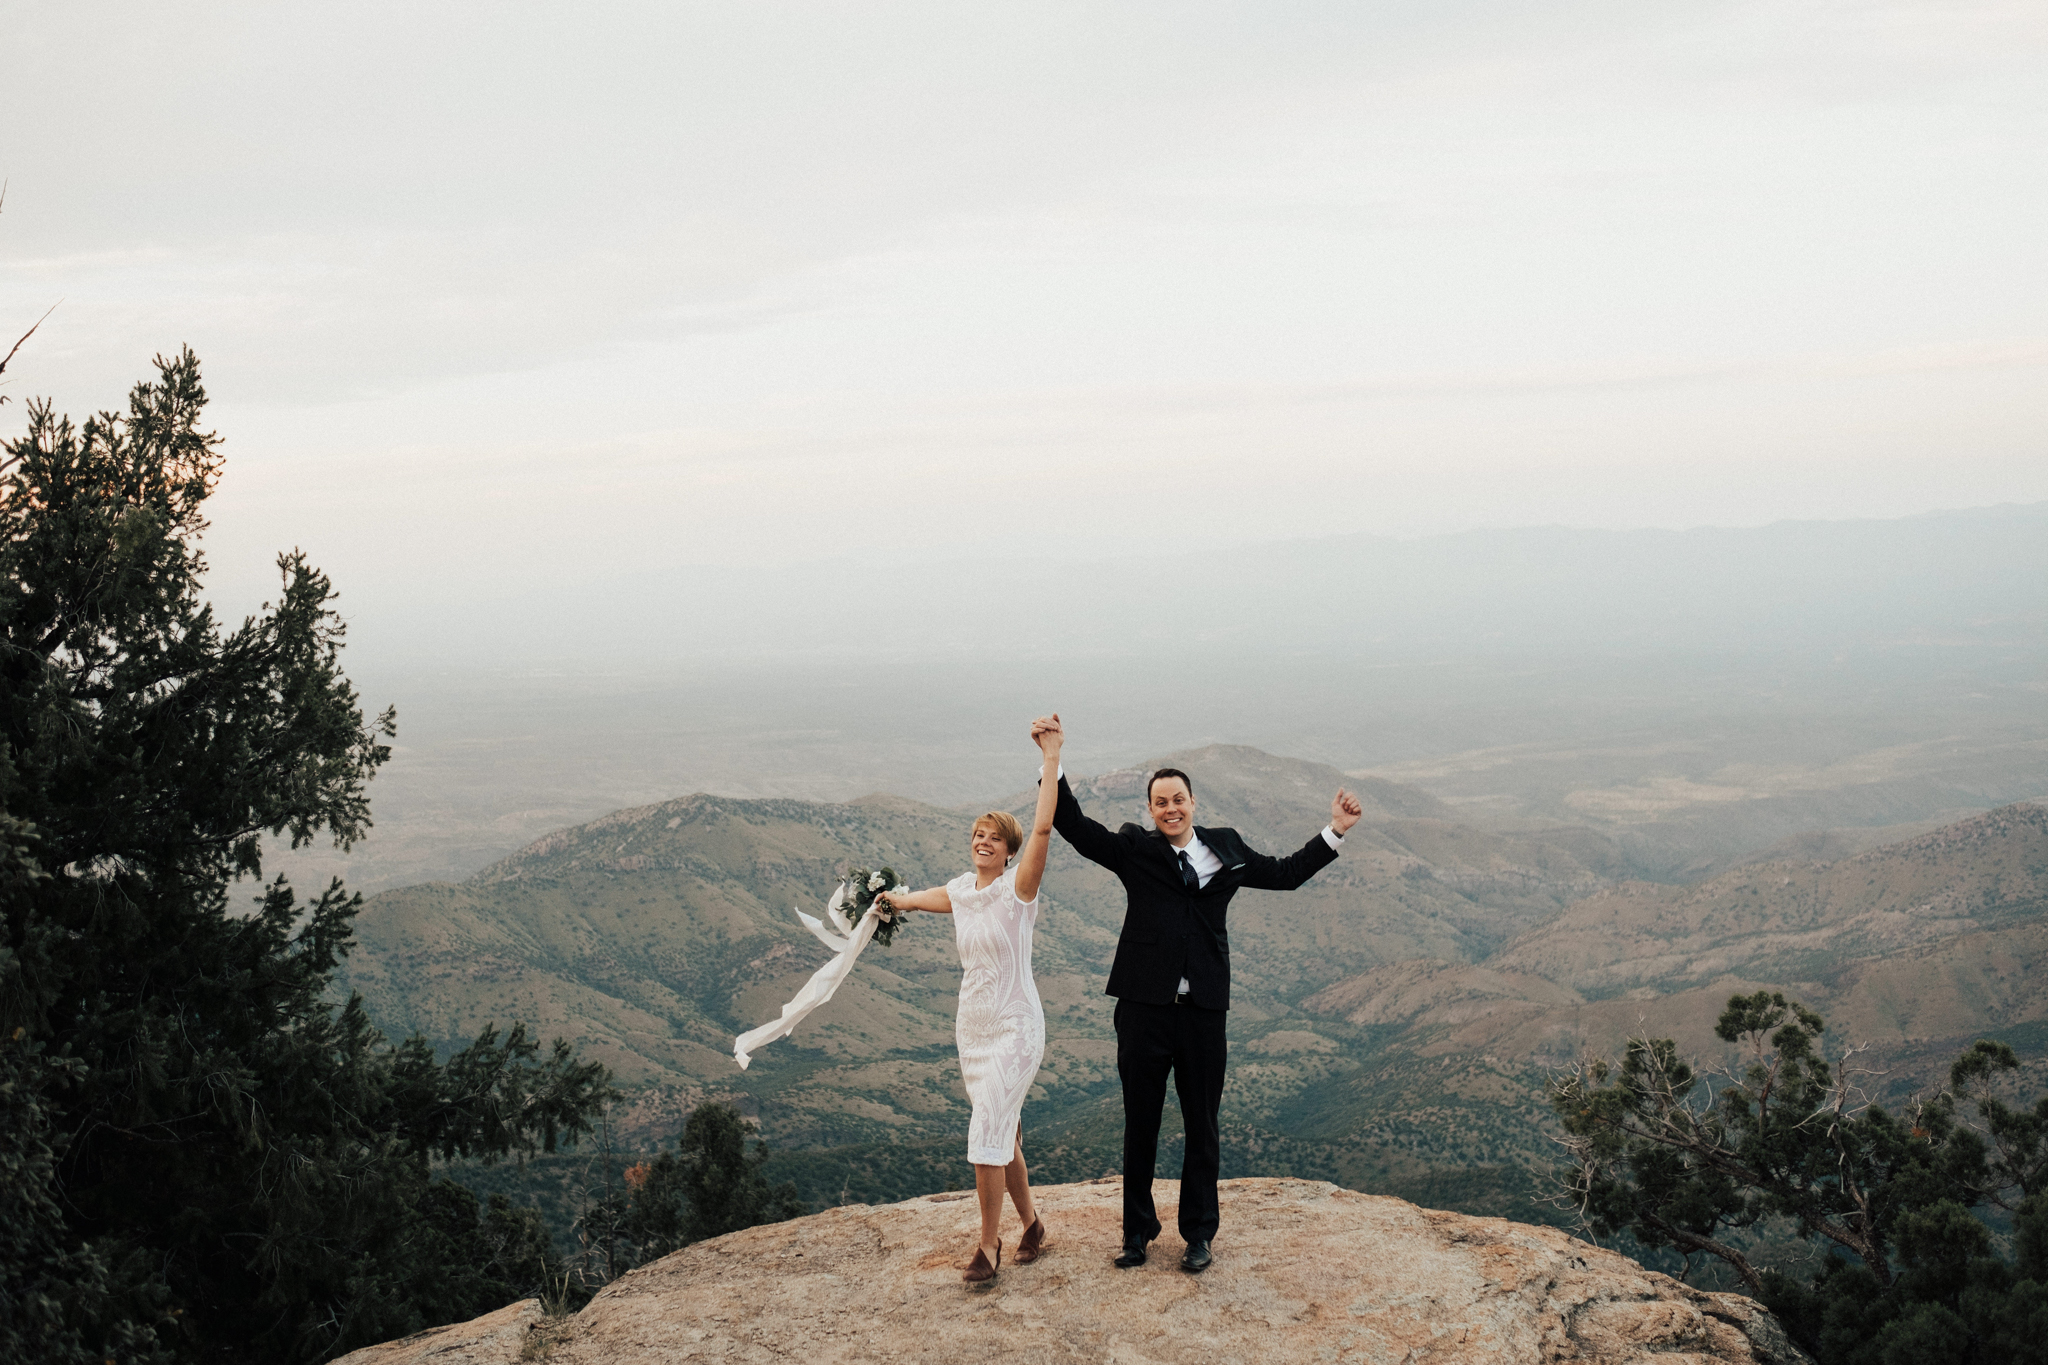 Arizona-Adventure-Elopement-Wedding-Photographer-121.jpg